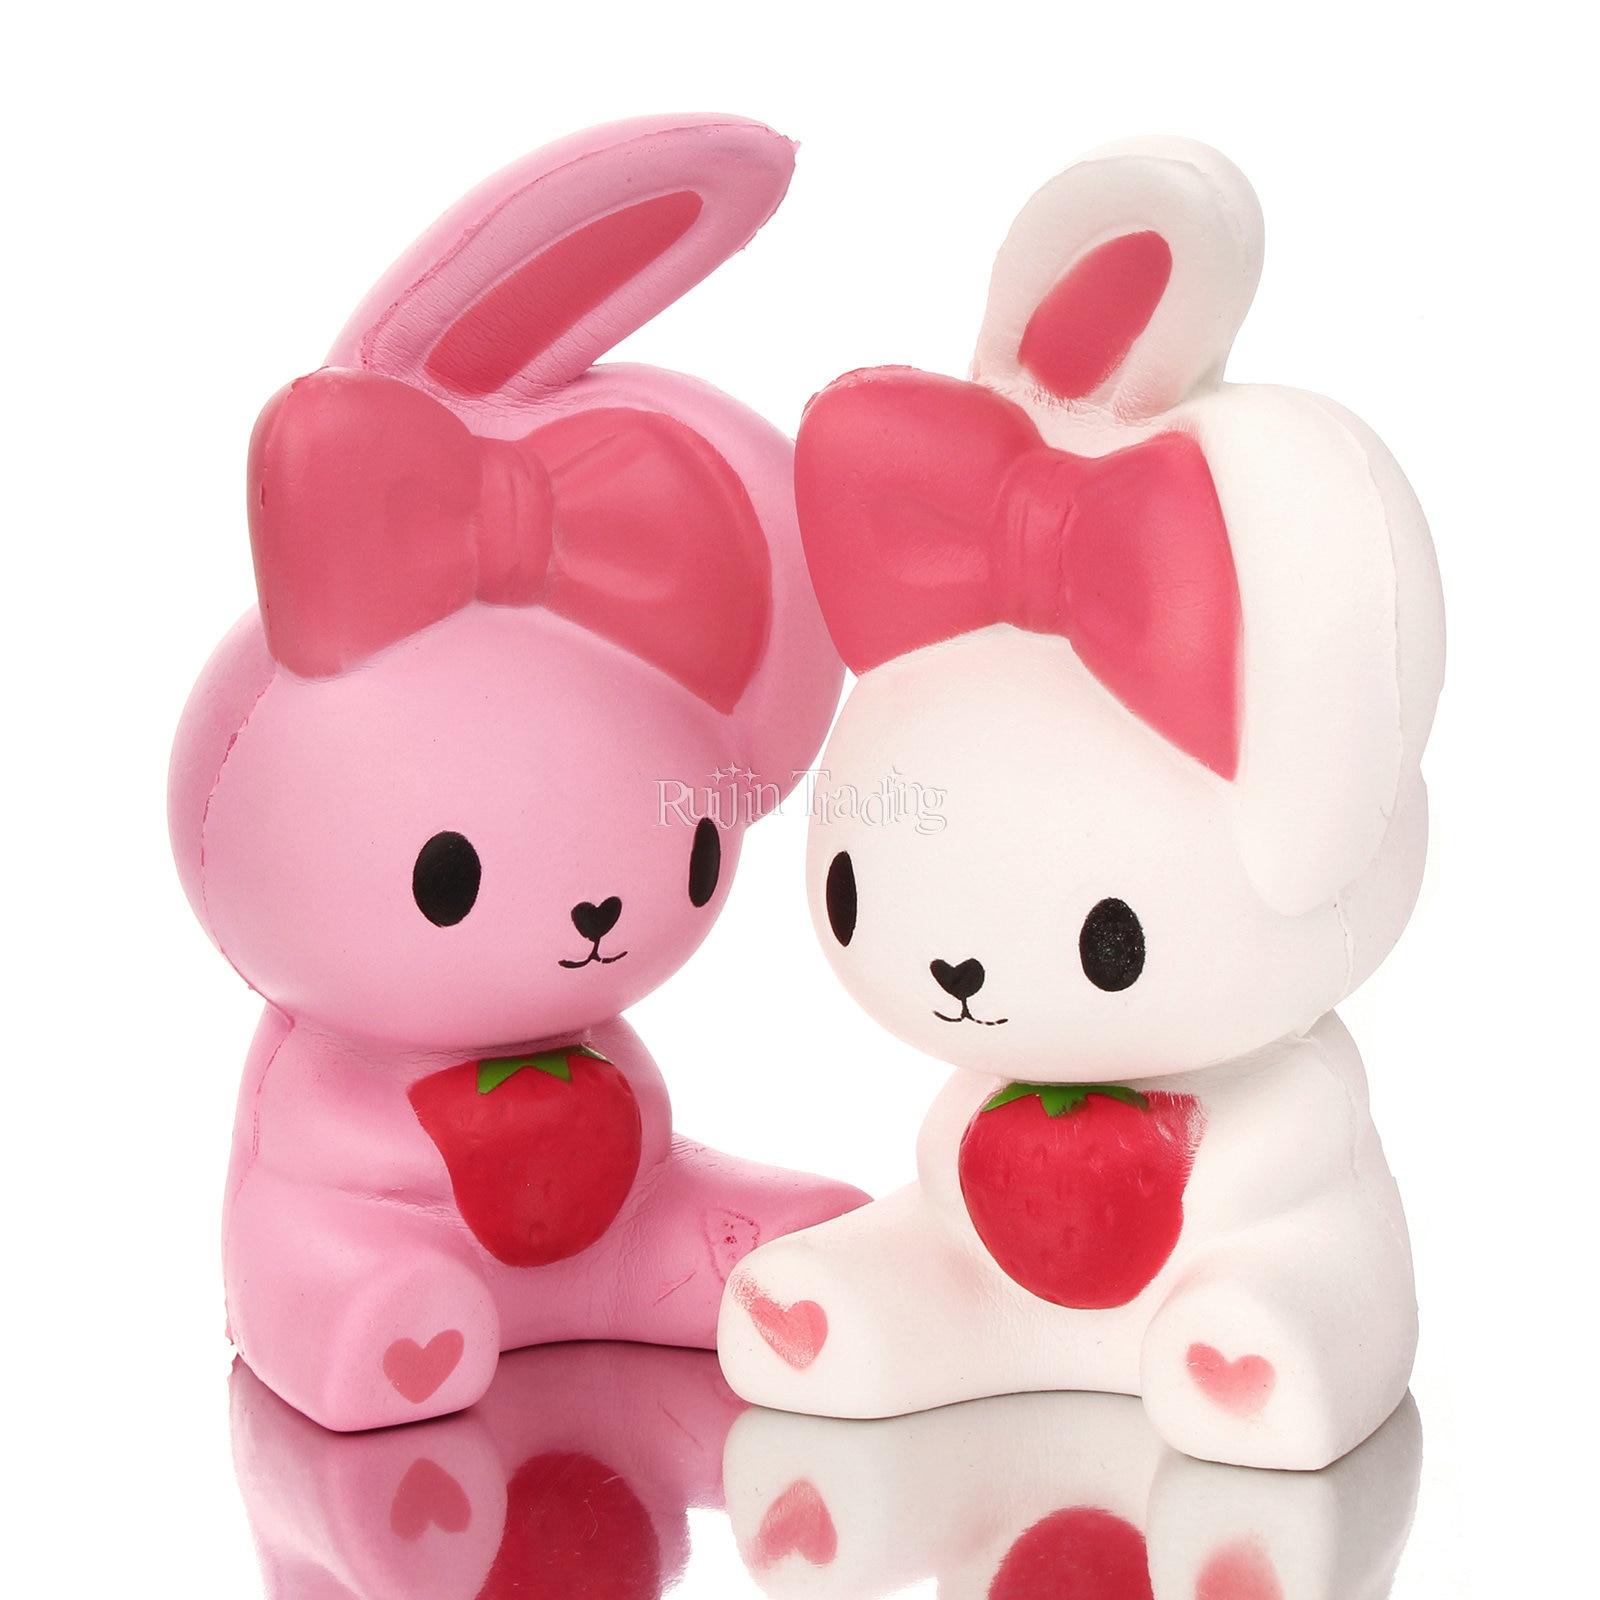 Kawaii Squishy Bunny : Random Color Slow Rising Kawaii Strawberry Rabbit Squishy Cute and Squishy